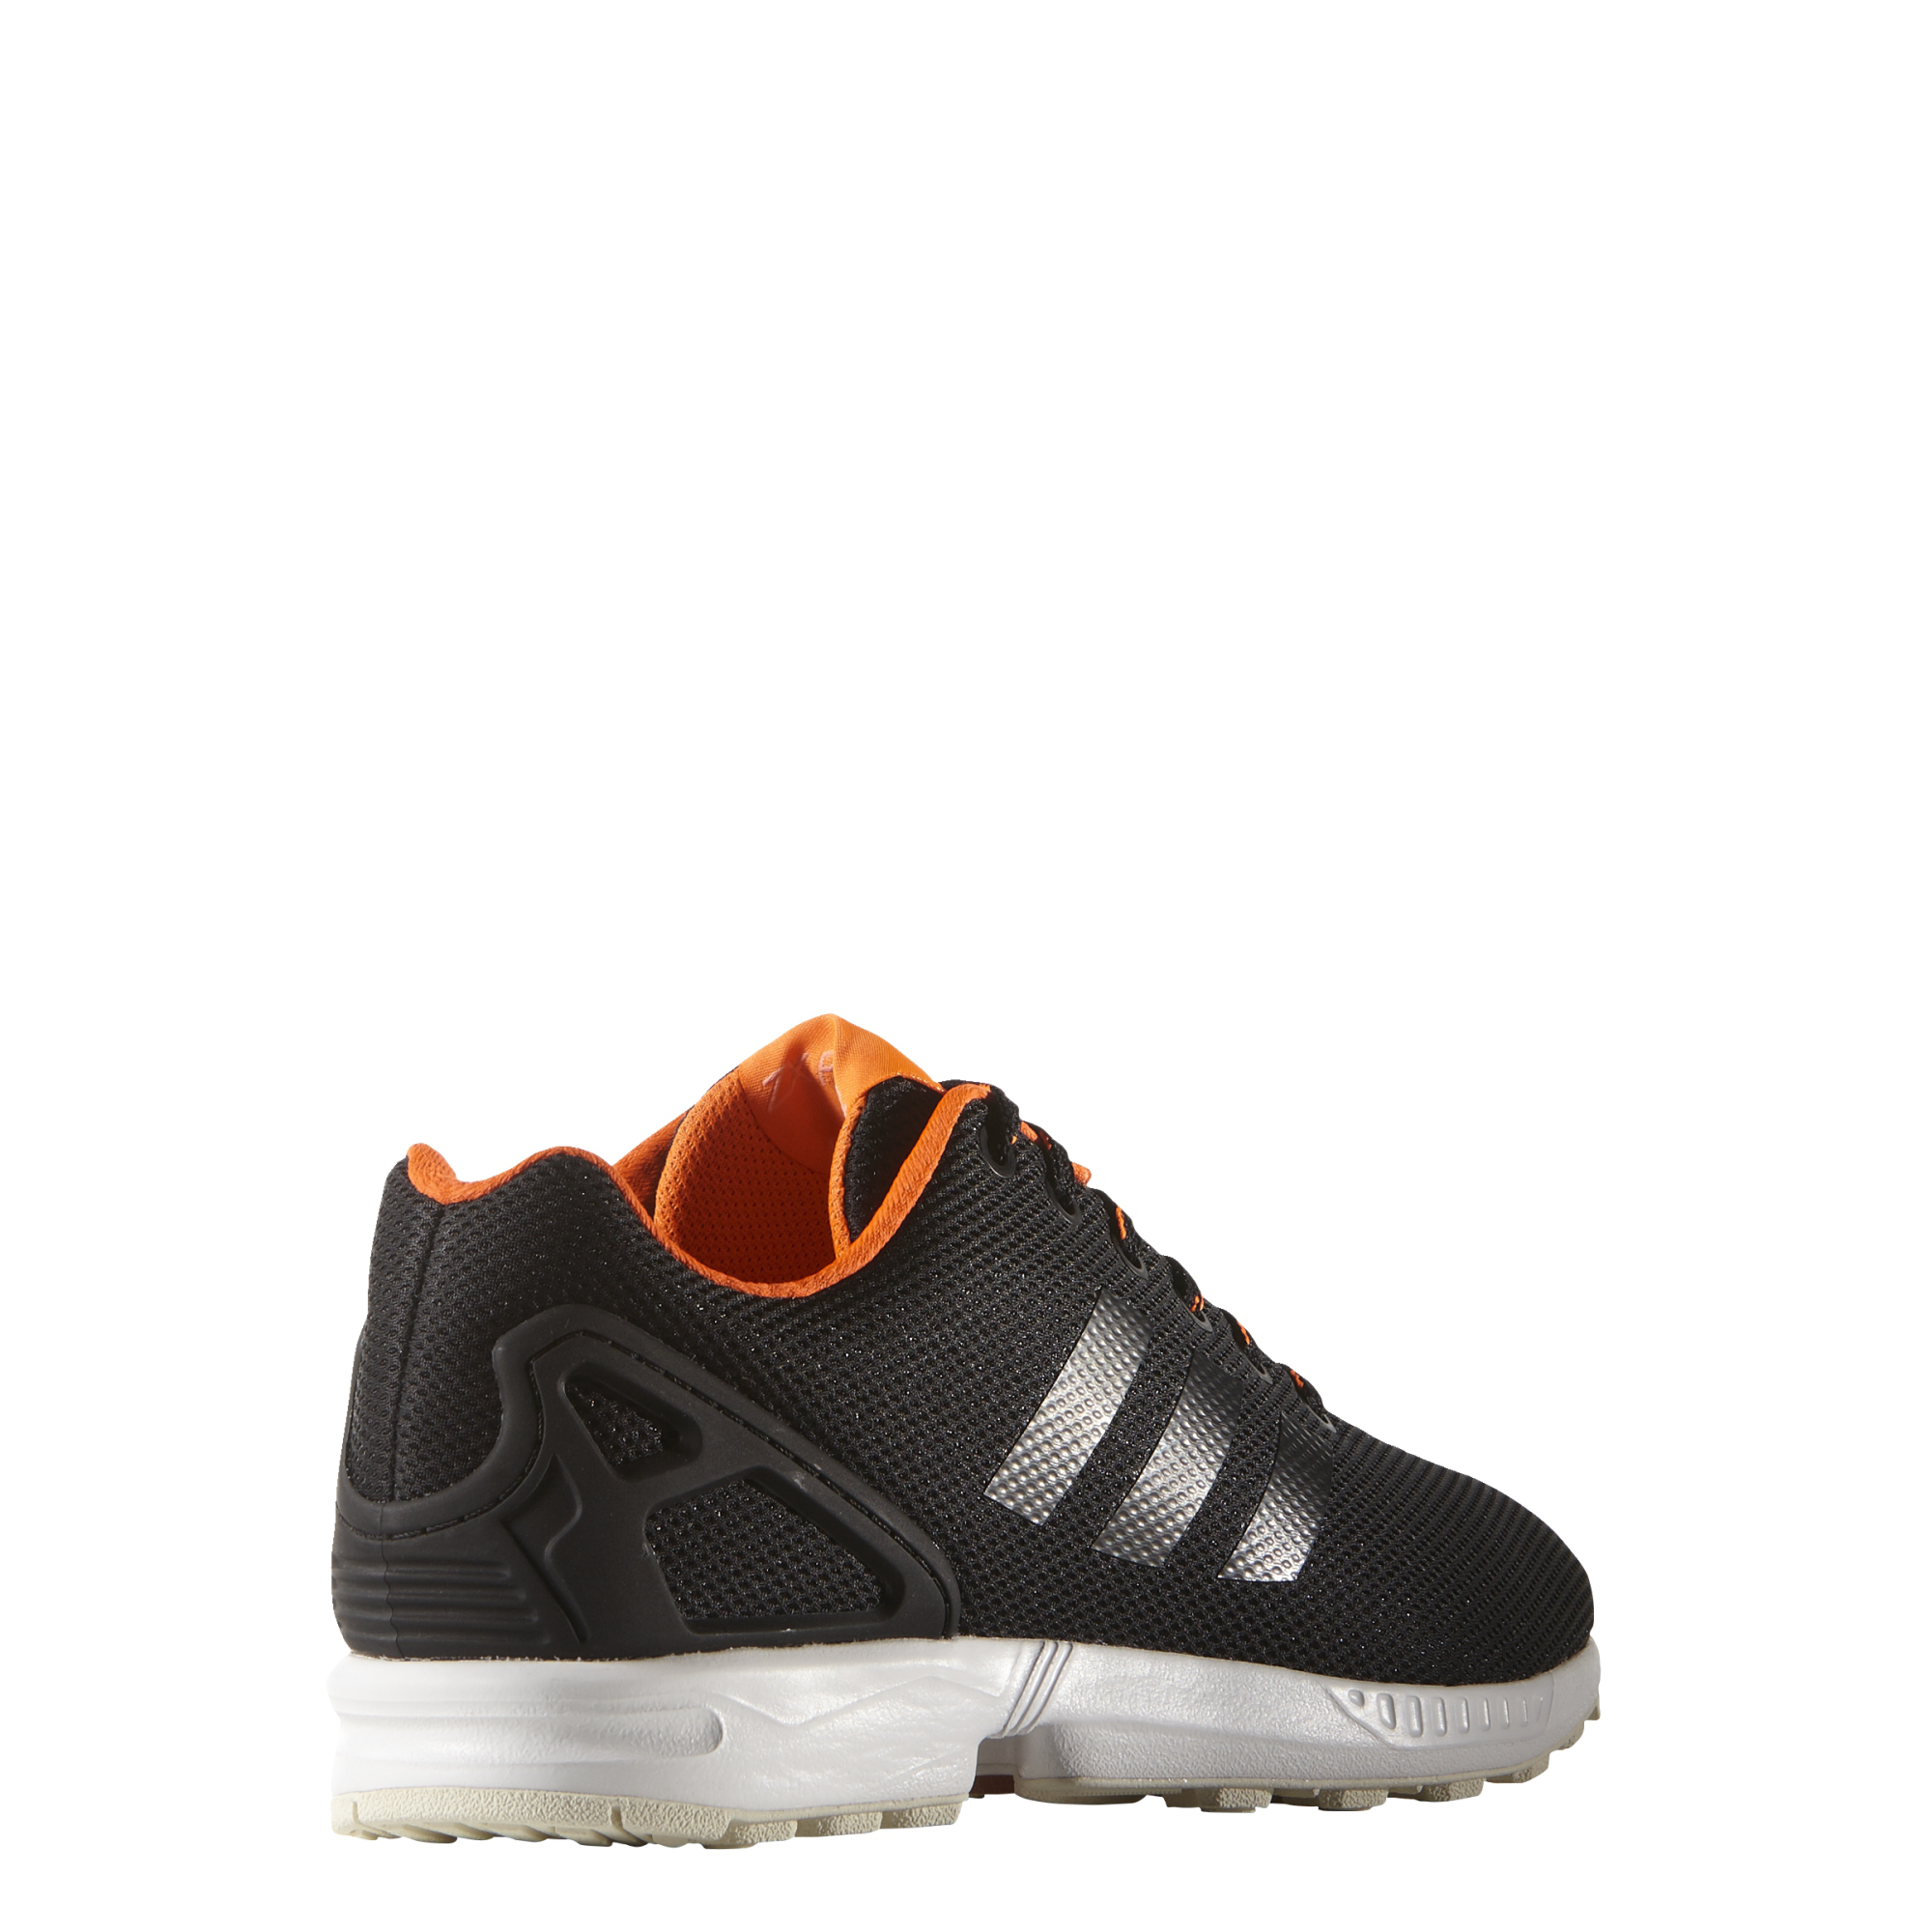 adidas Zx Flux S79099